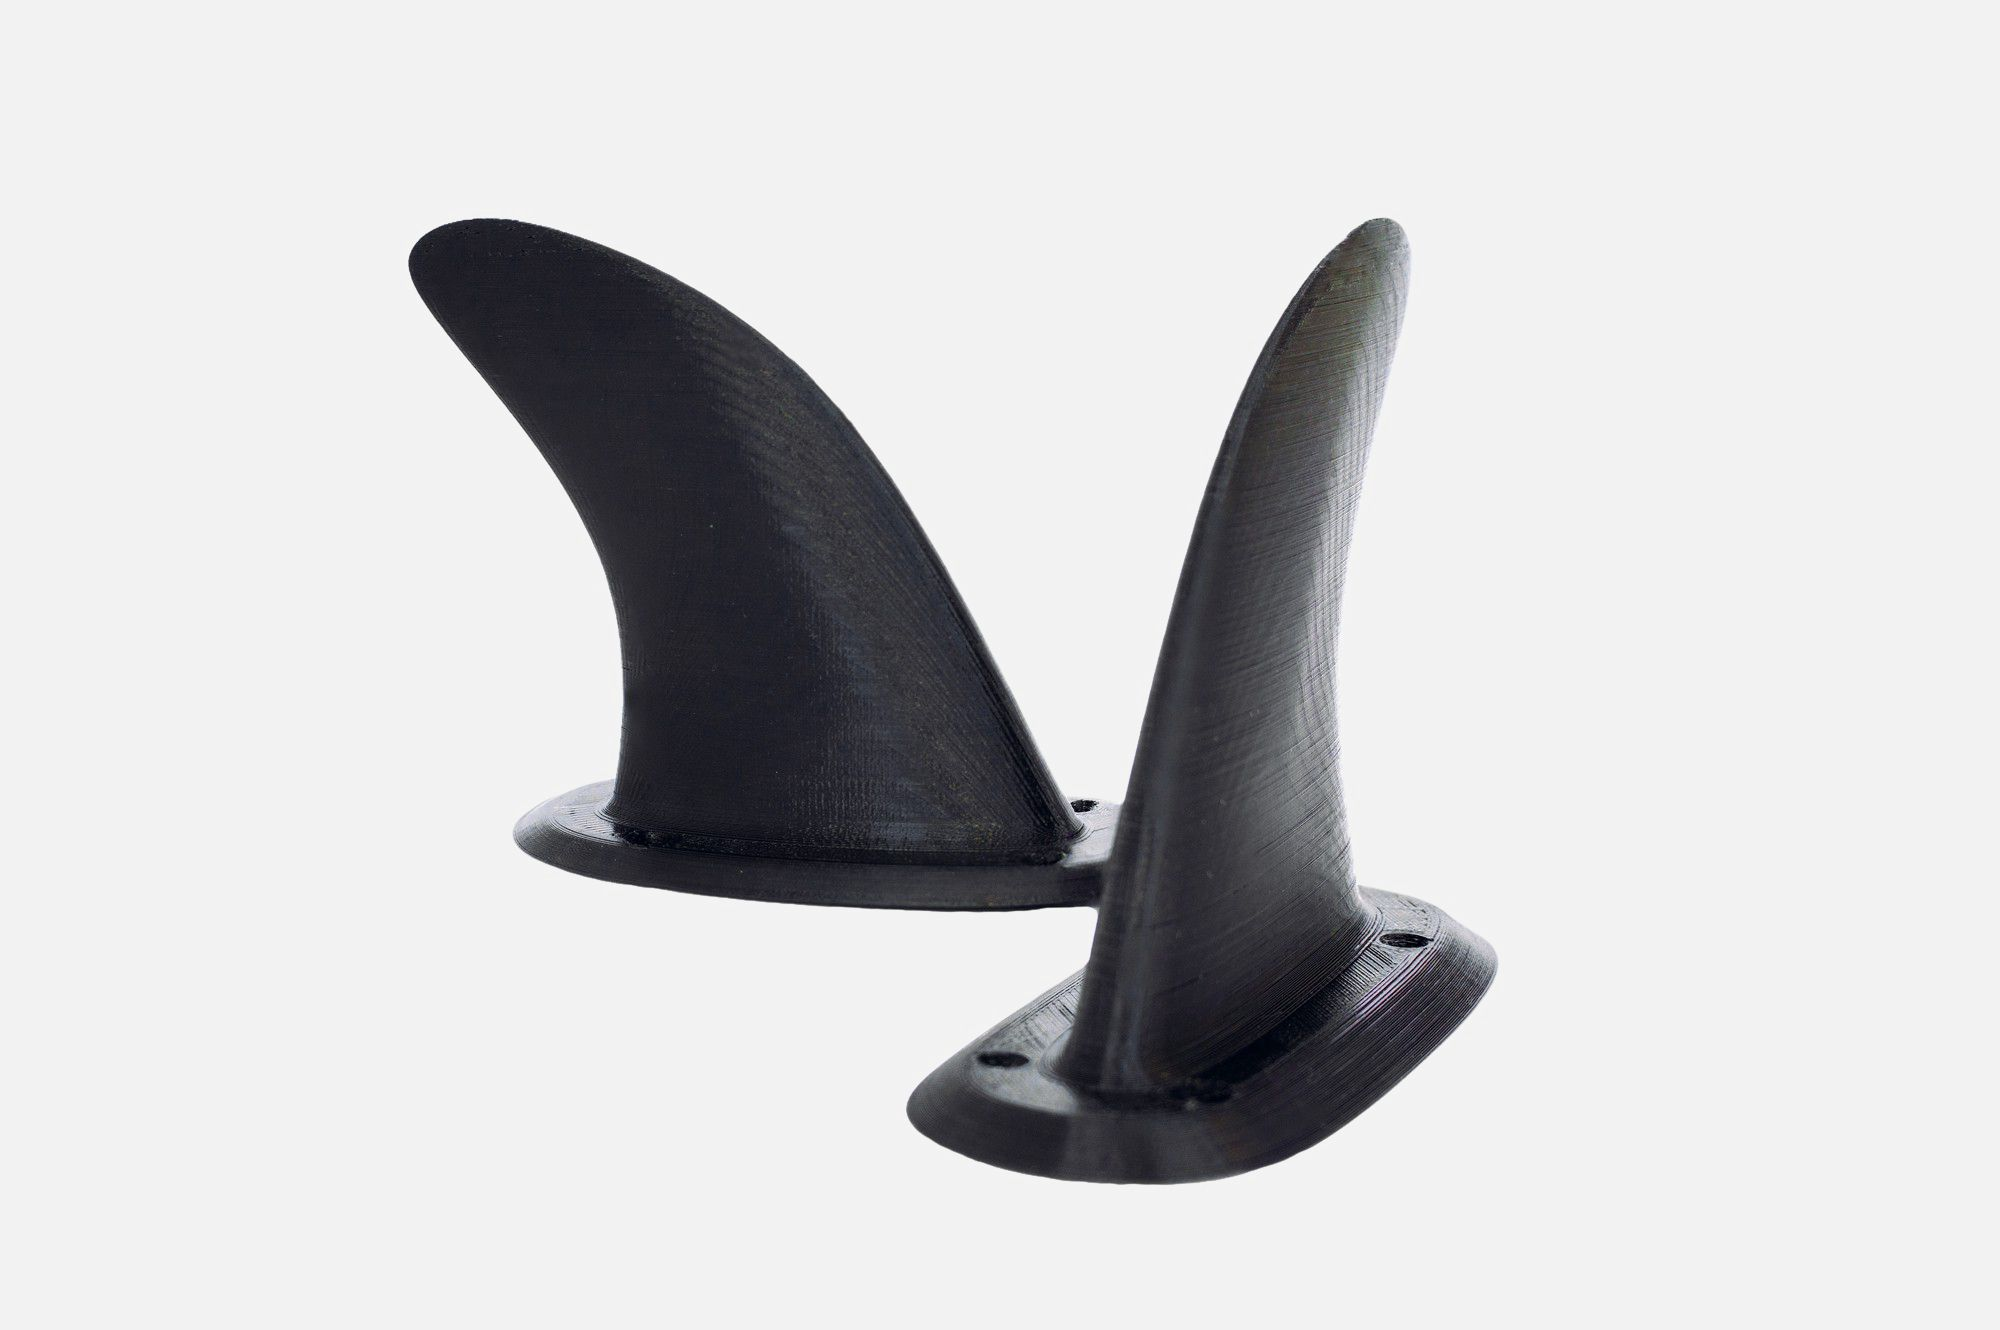 3d printed surboard fins using Nylon filament